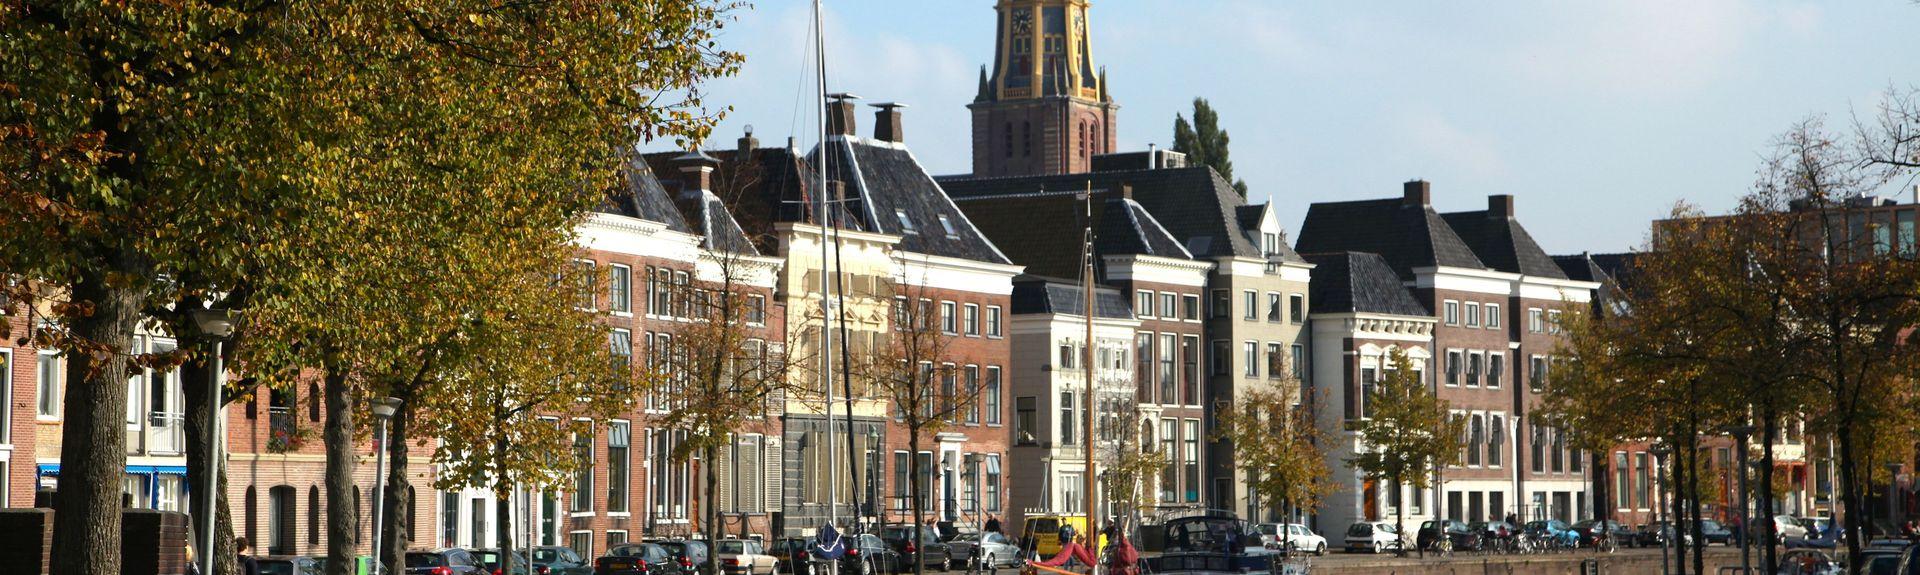 Zuidhorn, Netherlands